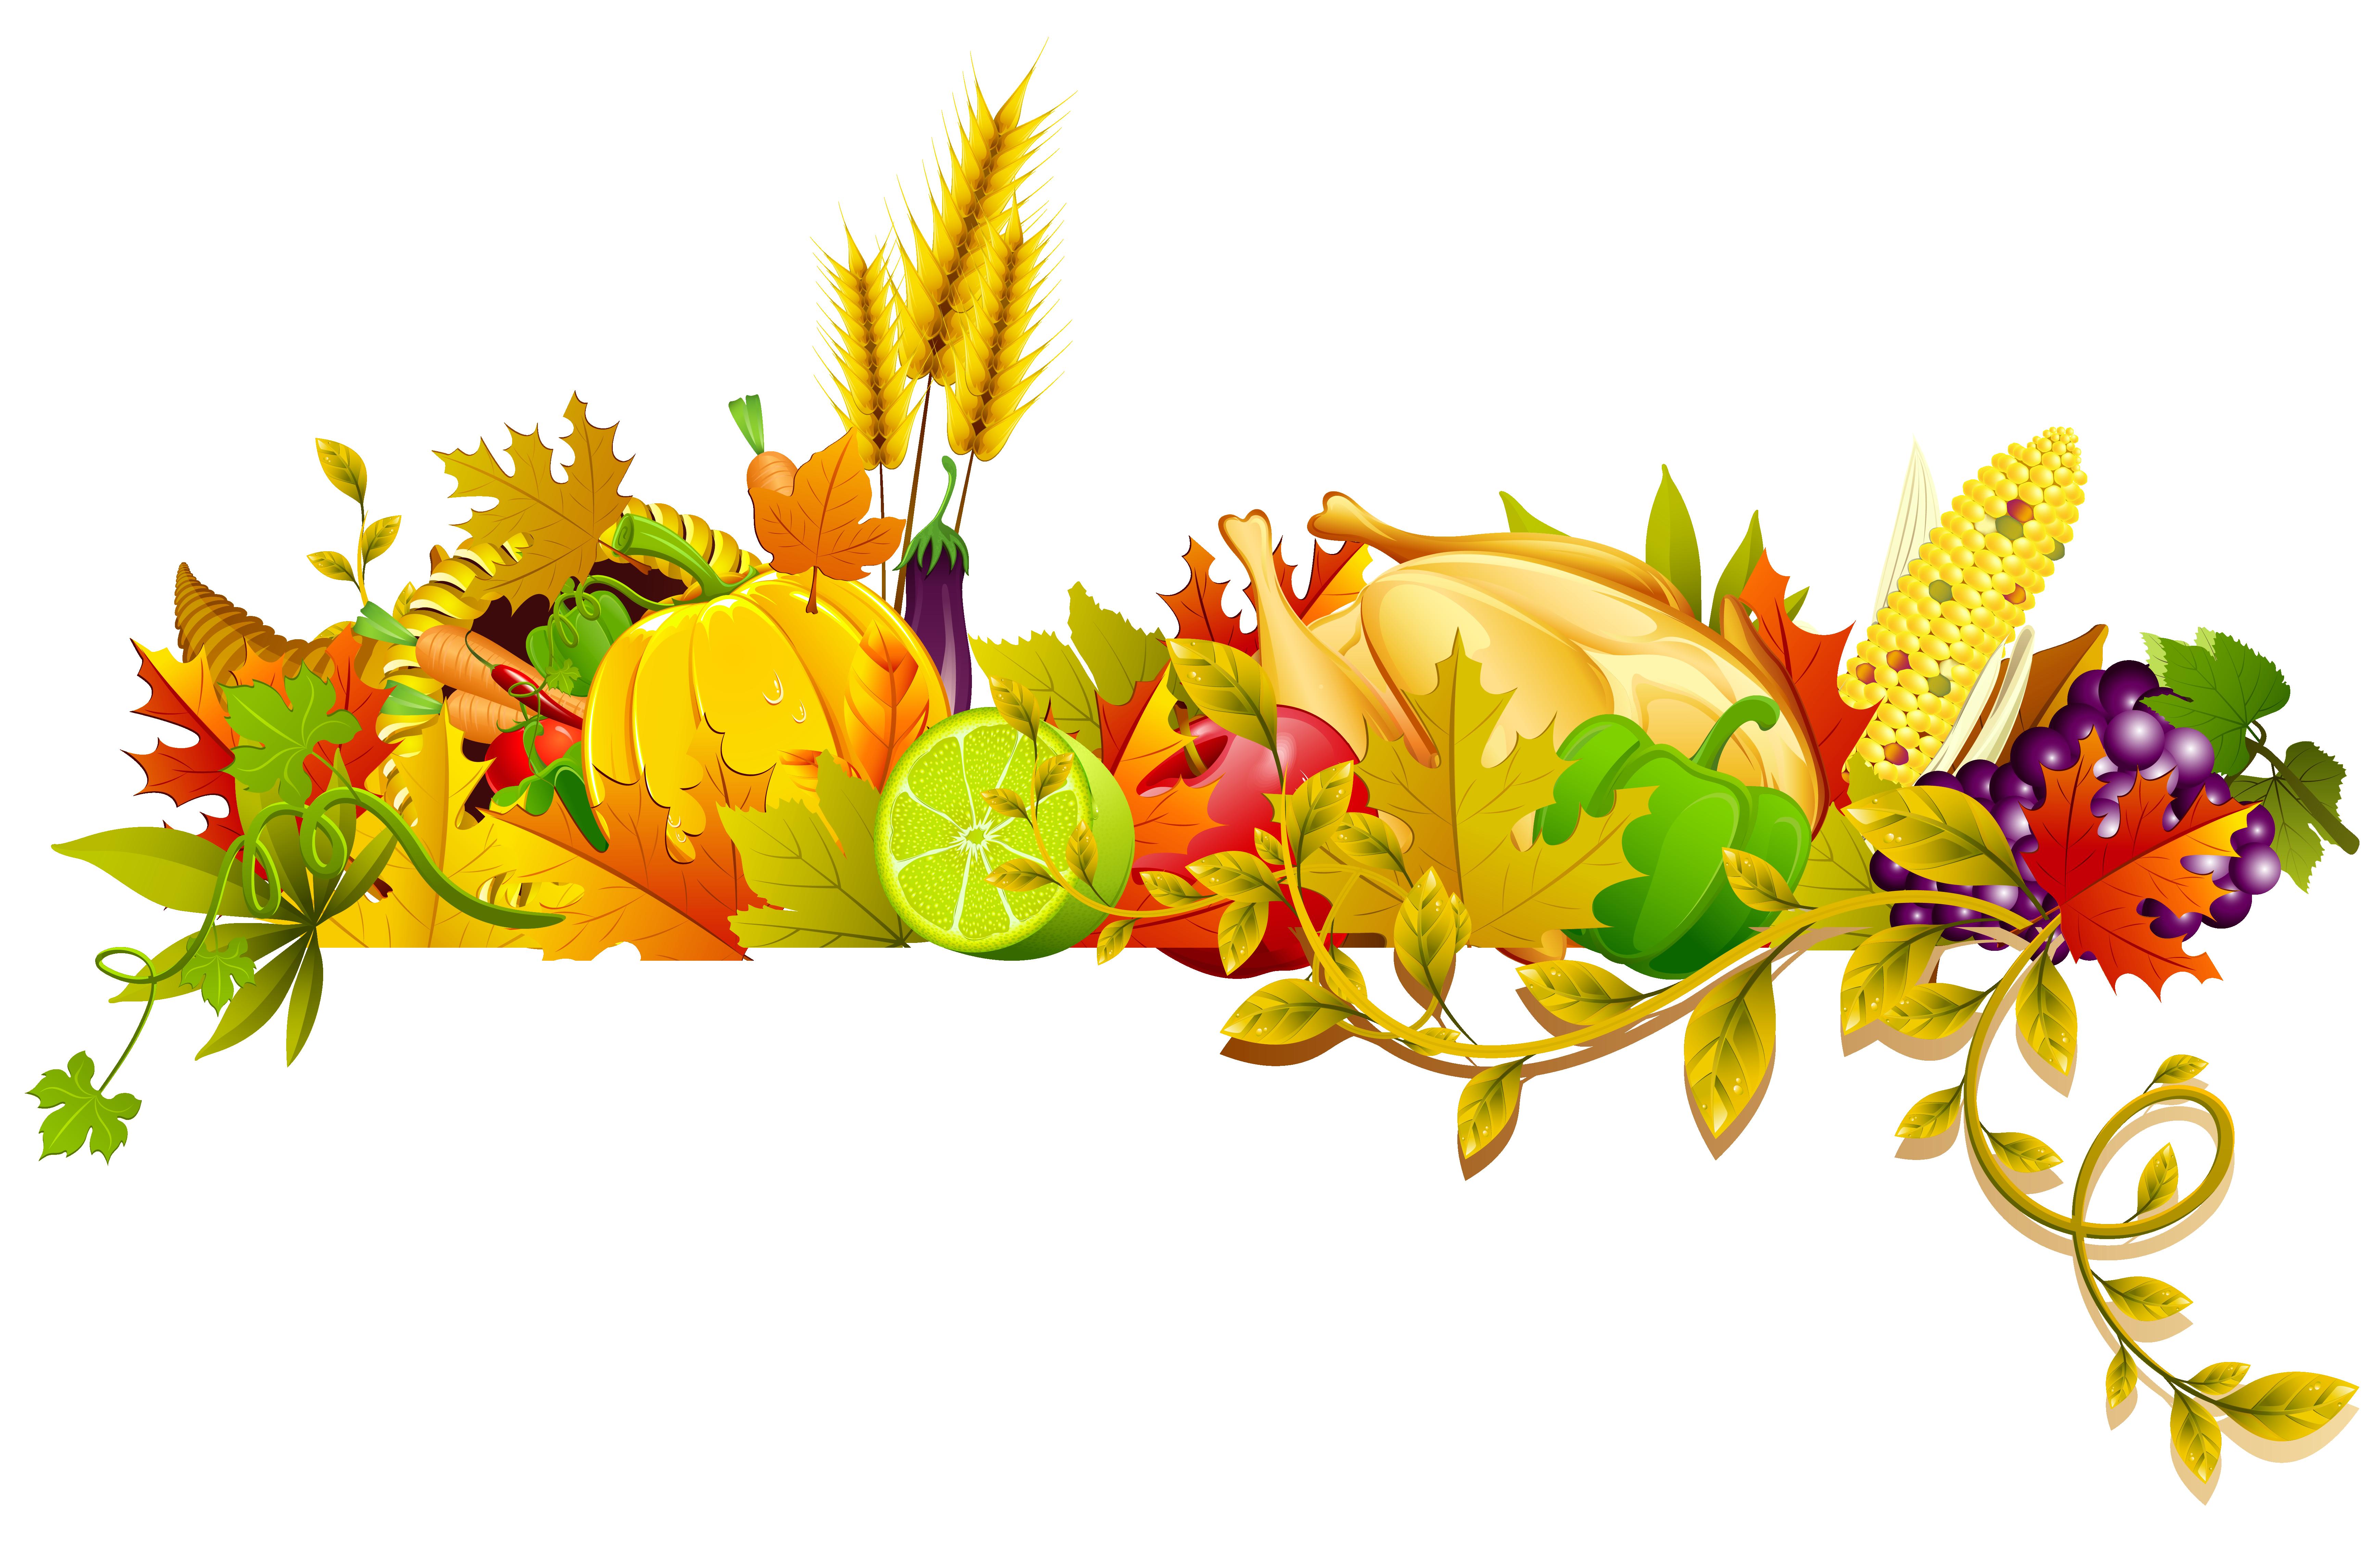 Harvest clipart decoration. Postharvest cotton picker autumn